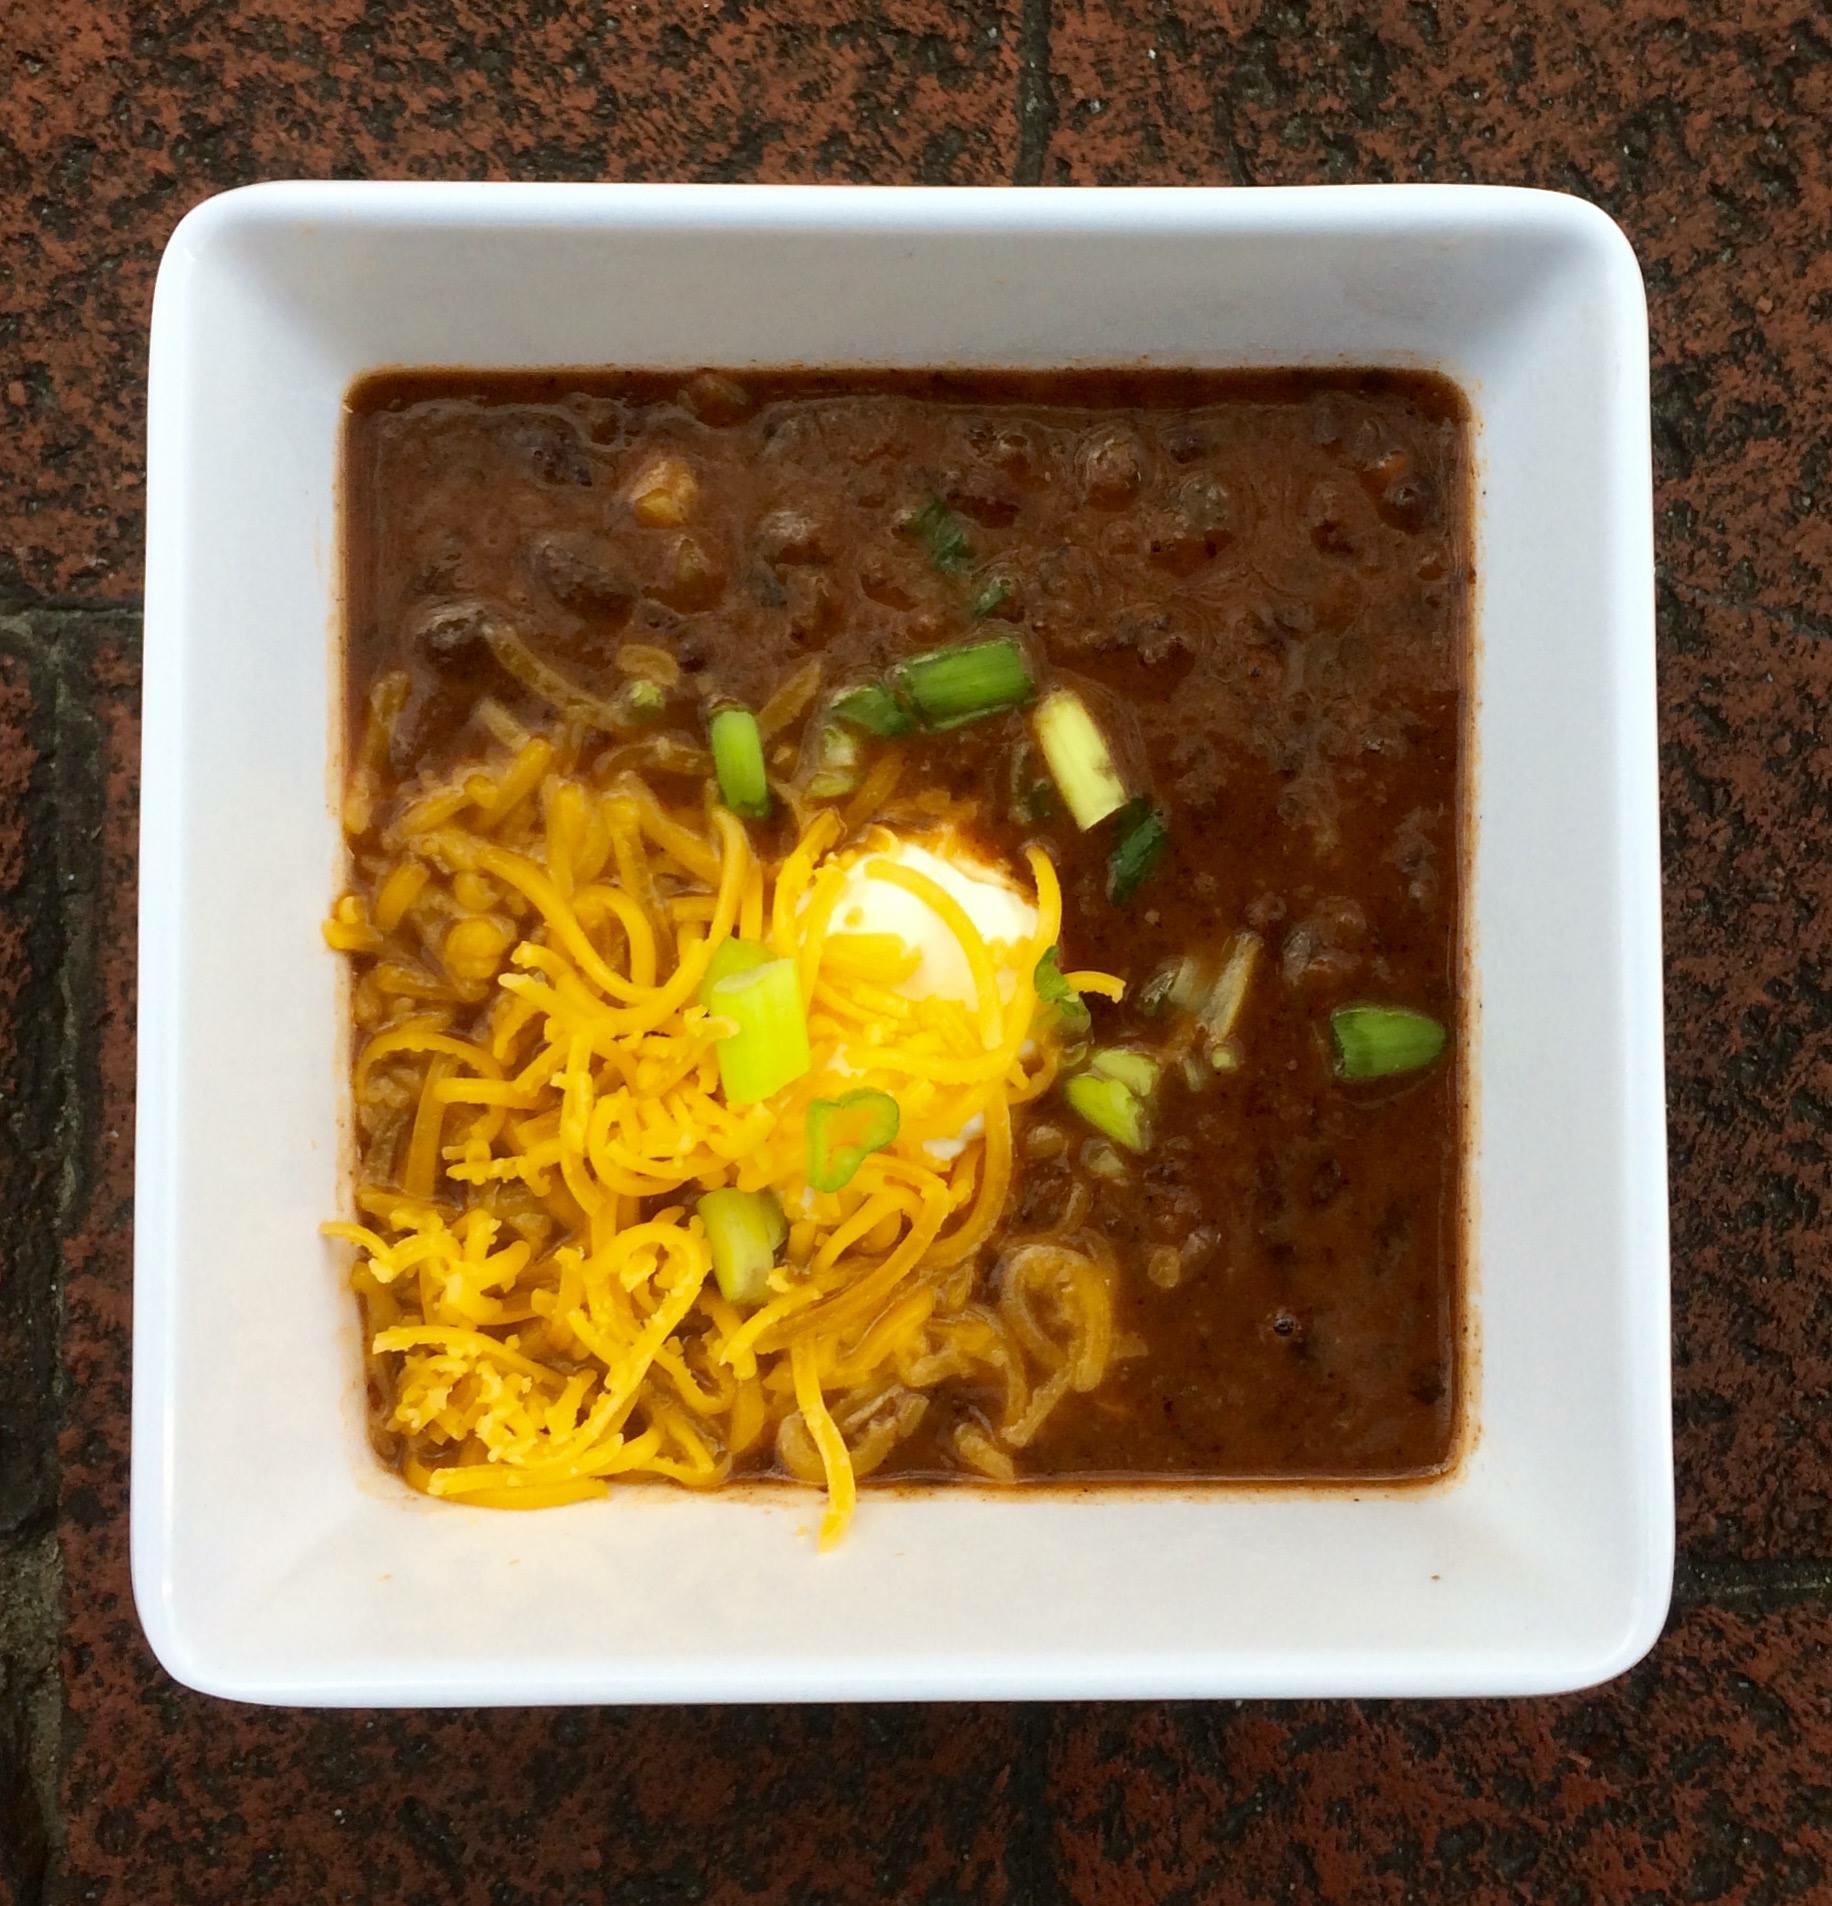 Vegan Black Bean Soup with Vegetarian Condiments: Sour Cream, Cheddar Cheese & Green Onion